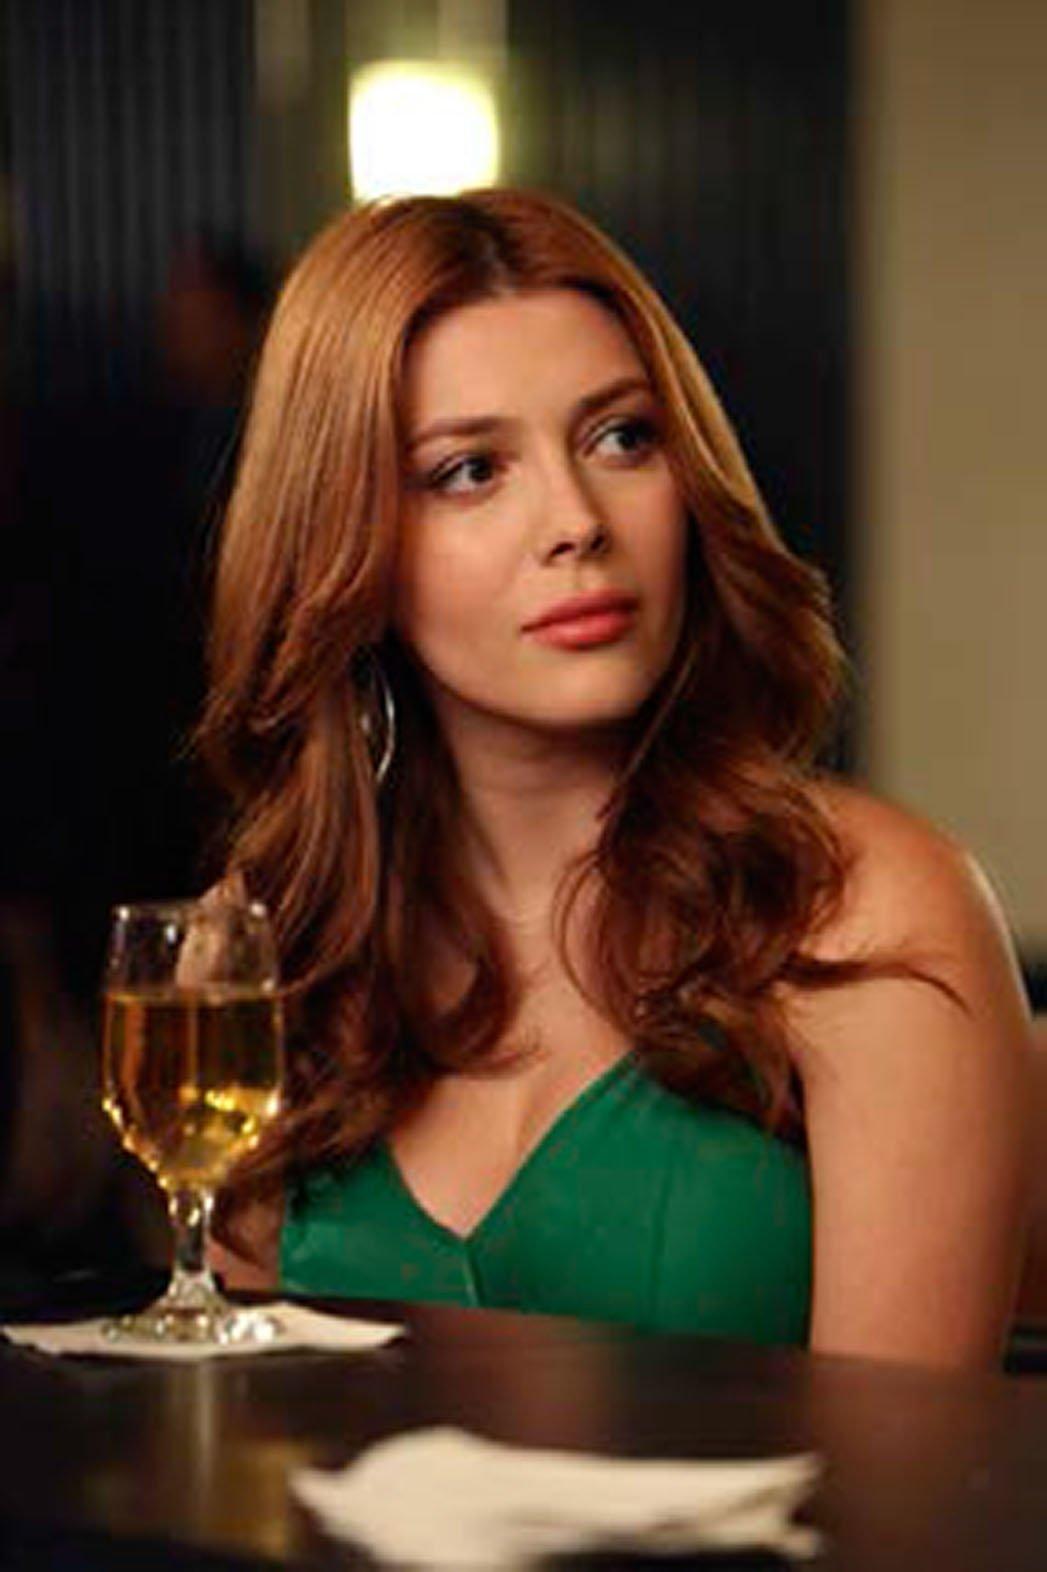 Elena satine red hair